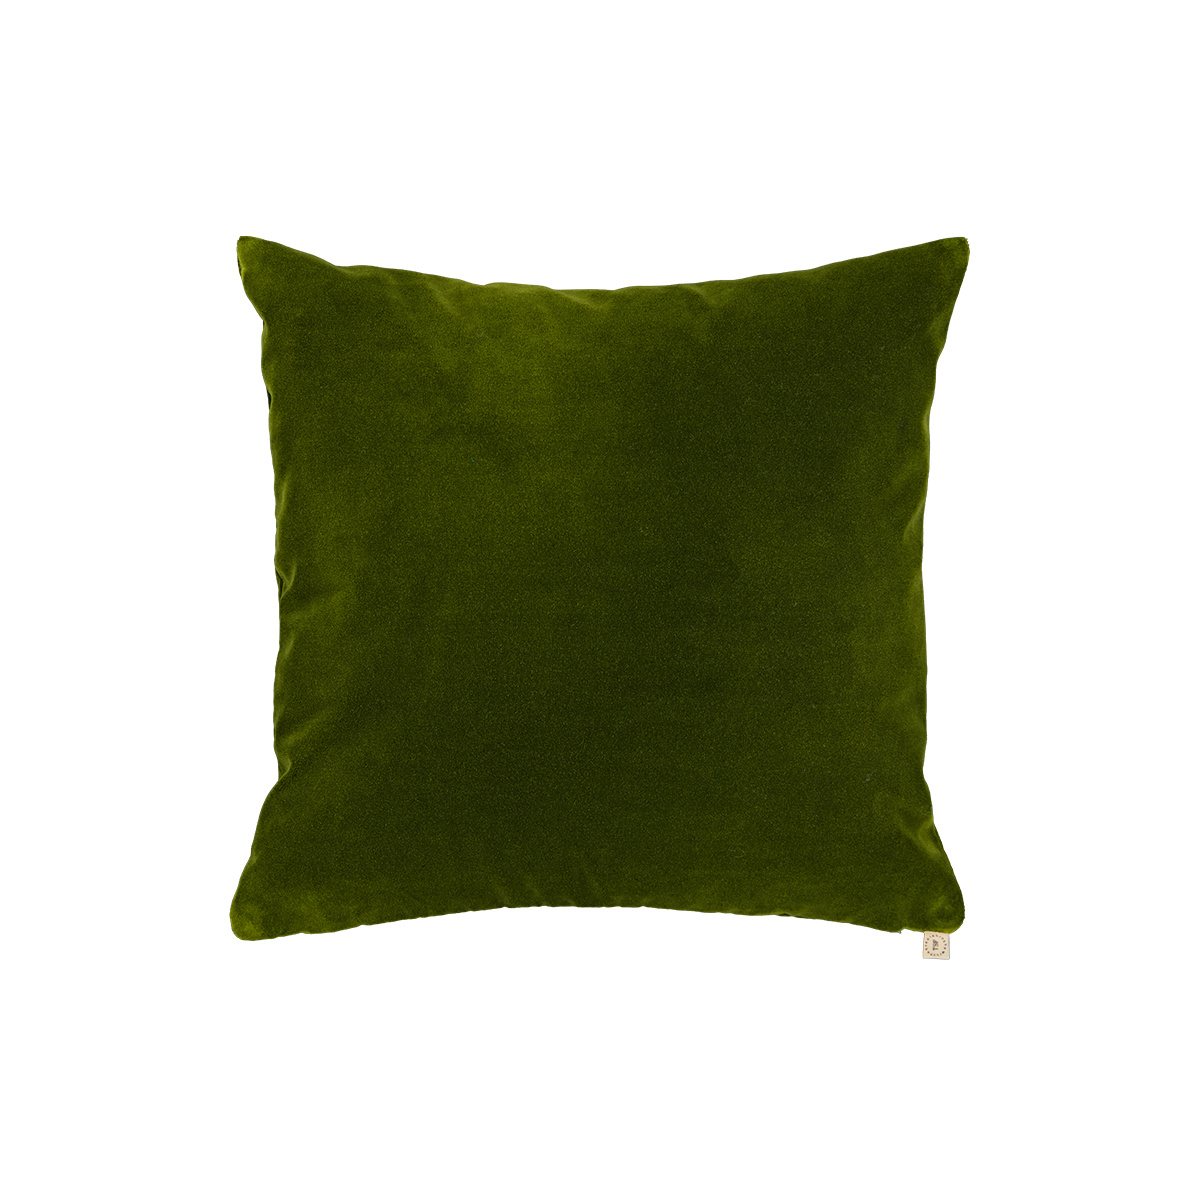 Coussin Carino velours vert sapin